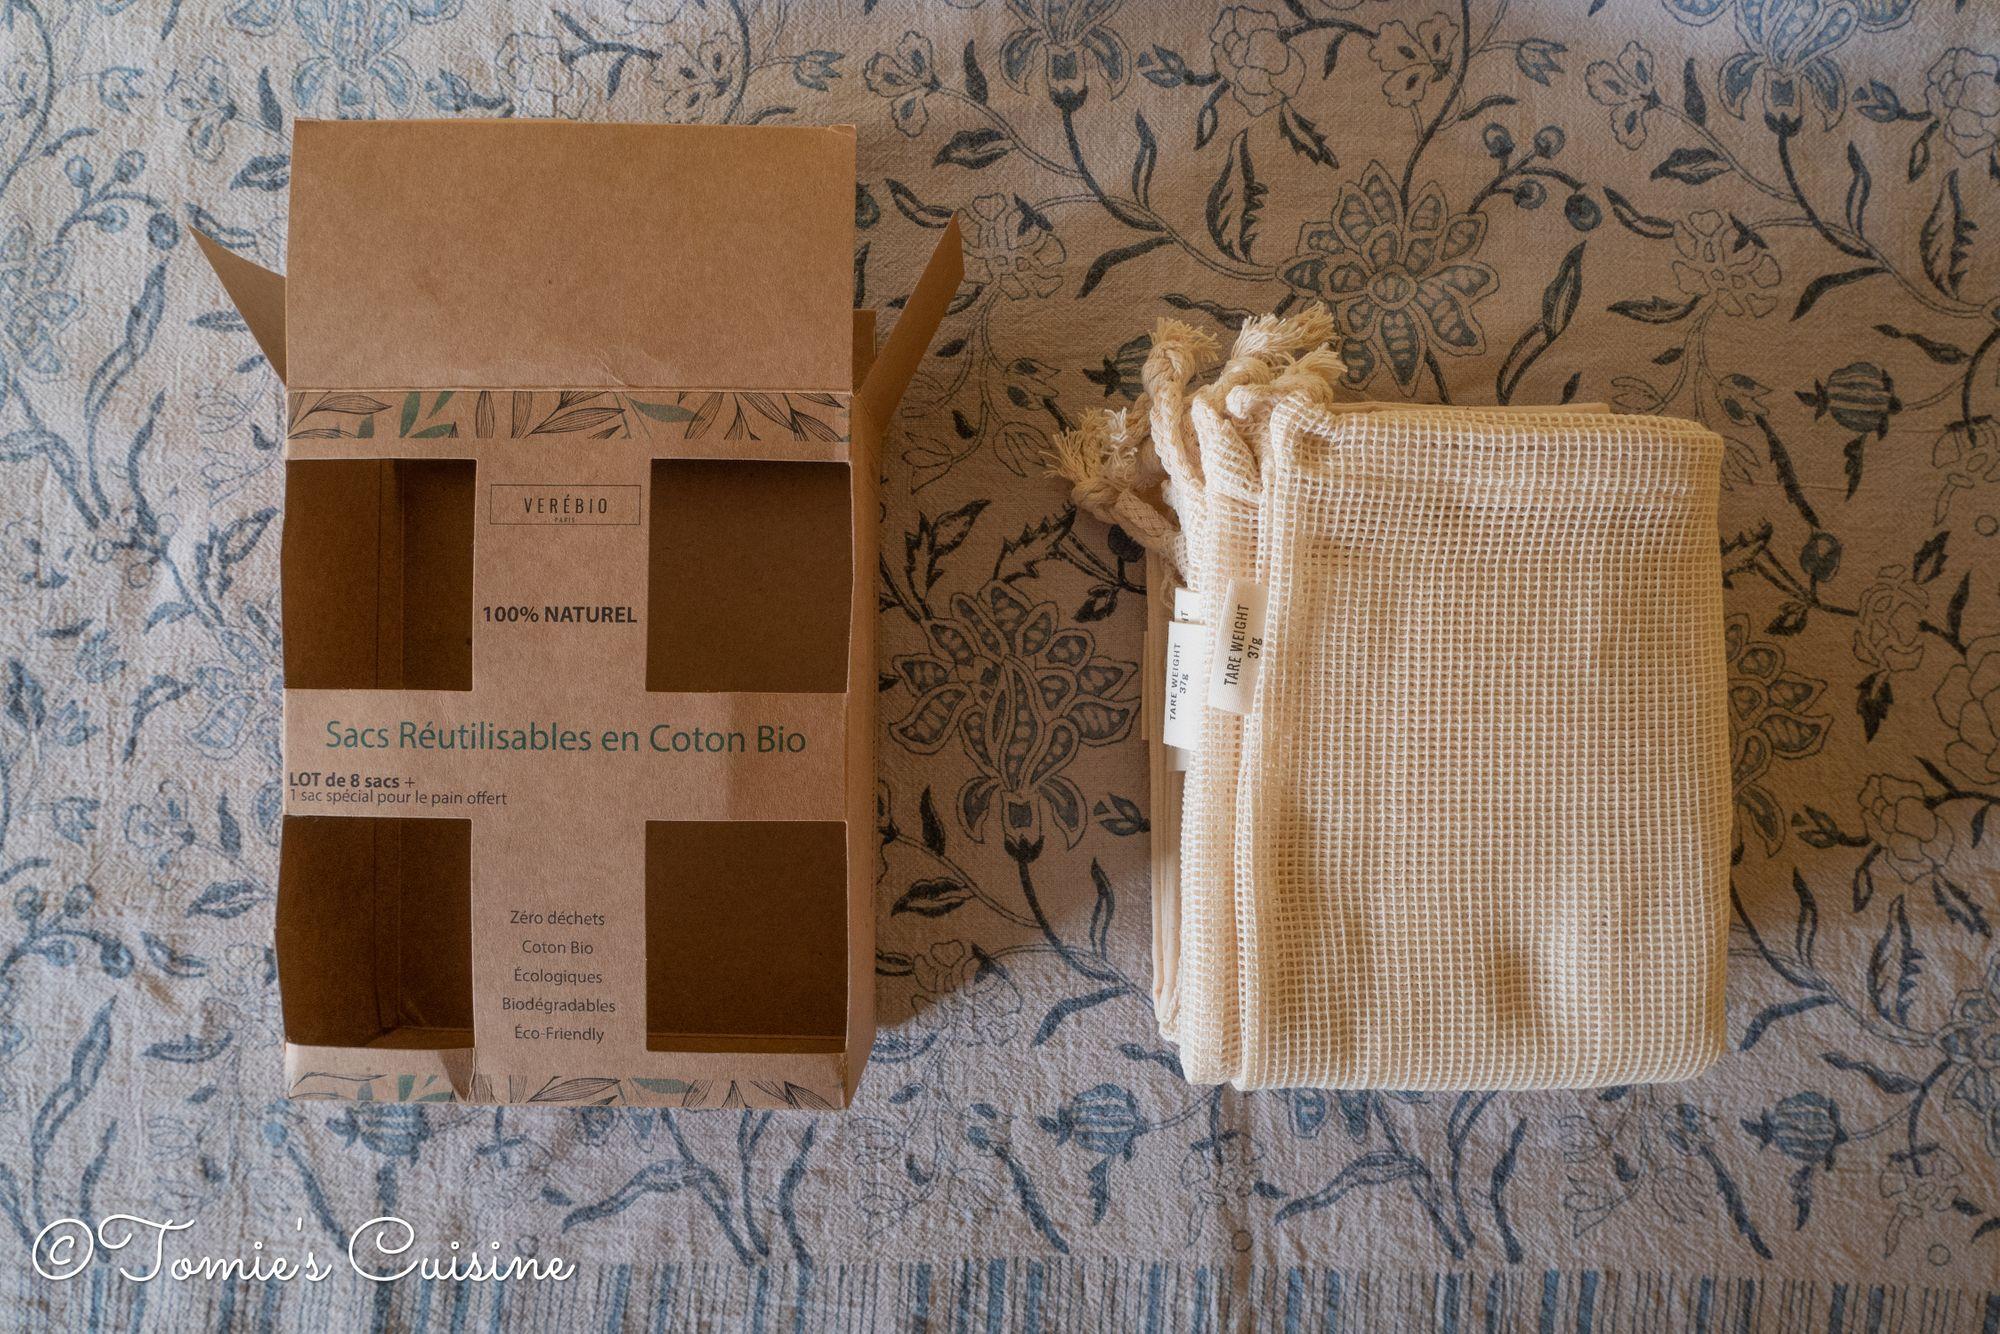 A tidy cardboard packaging